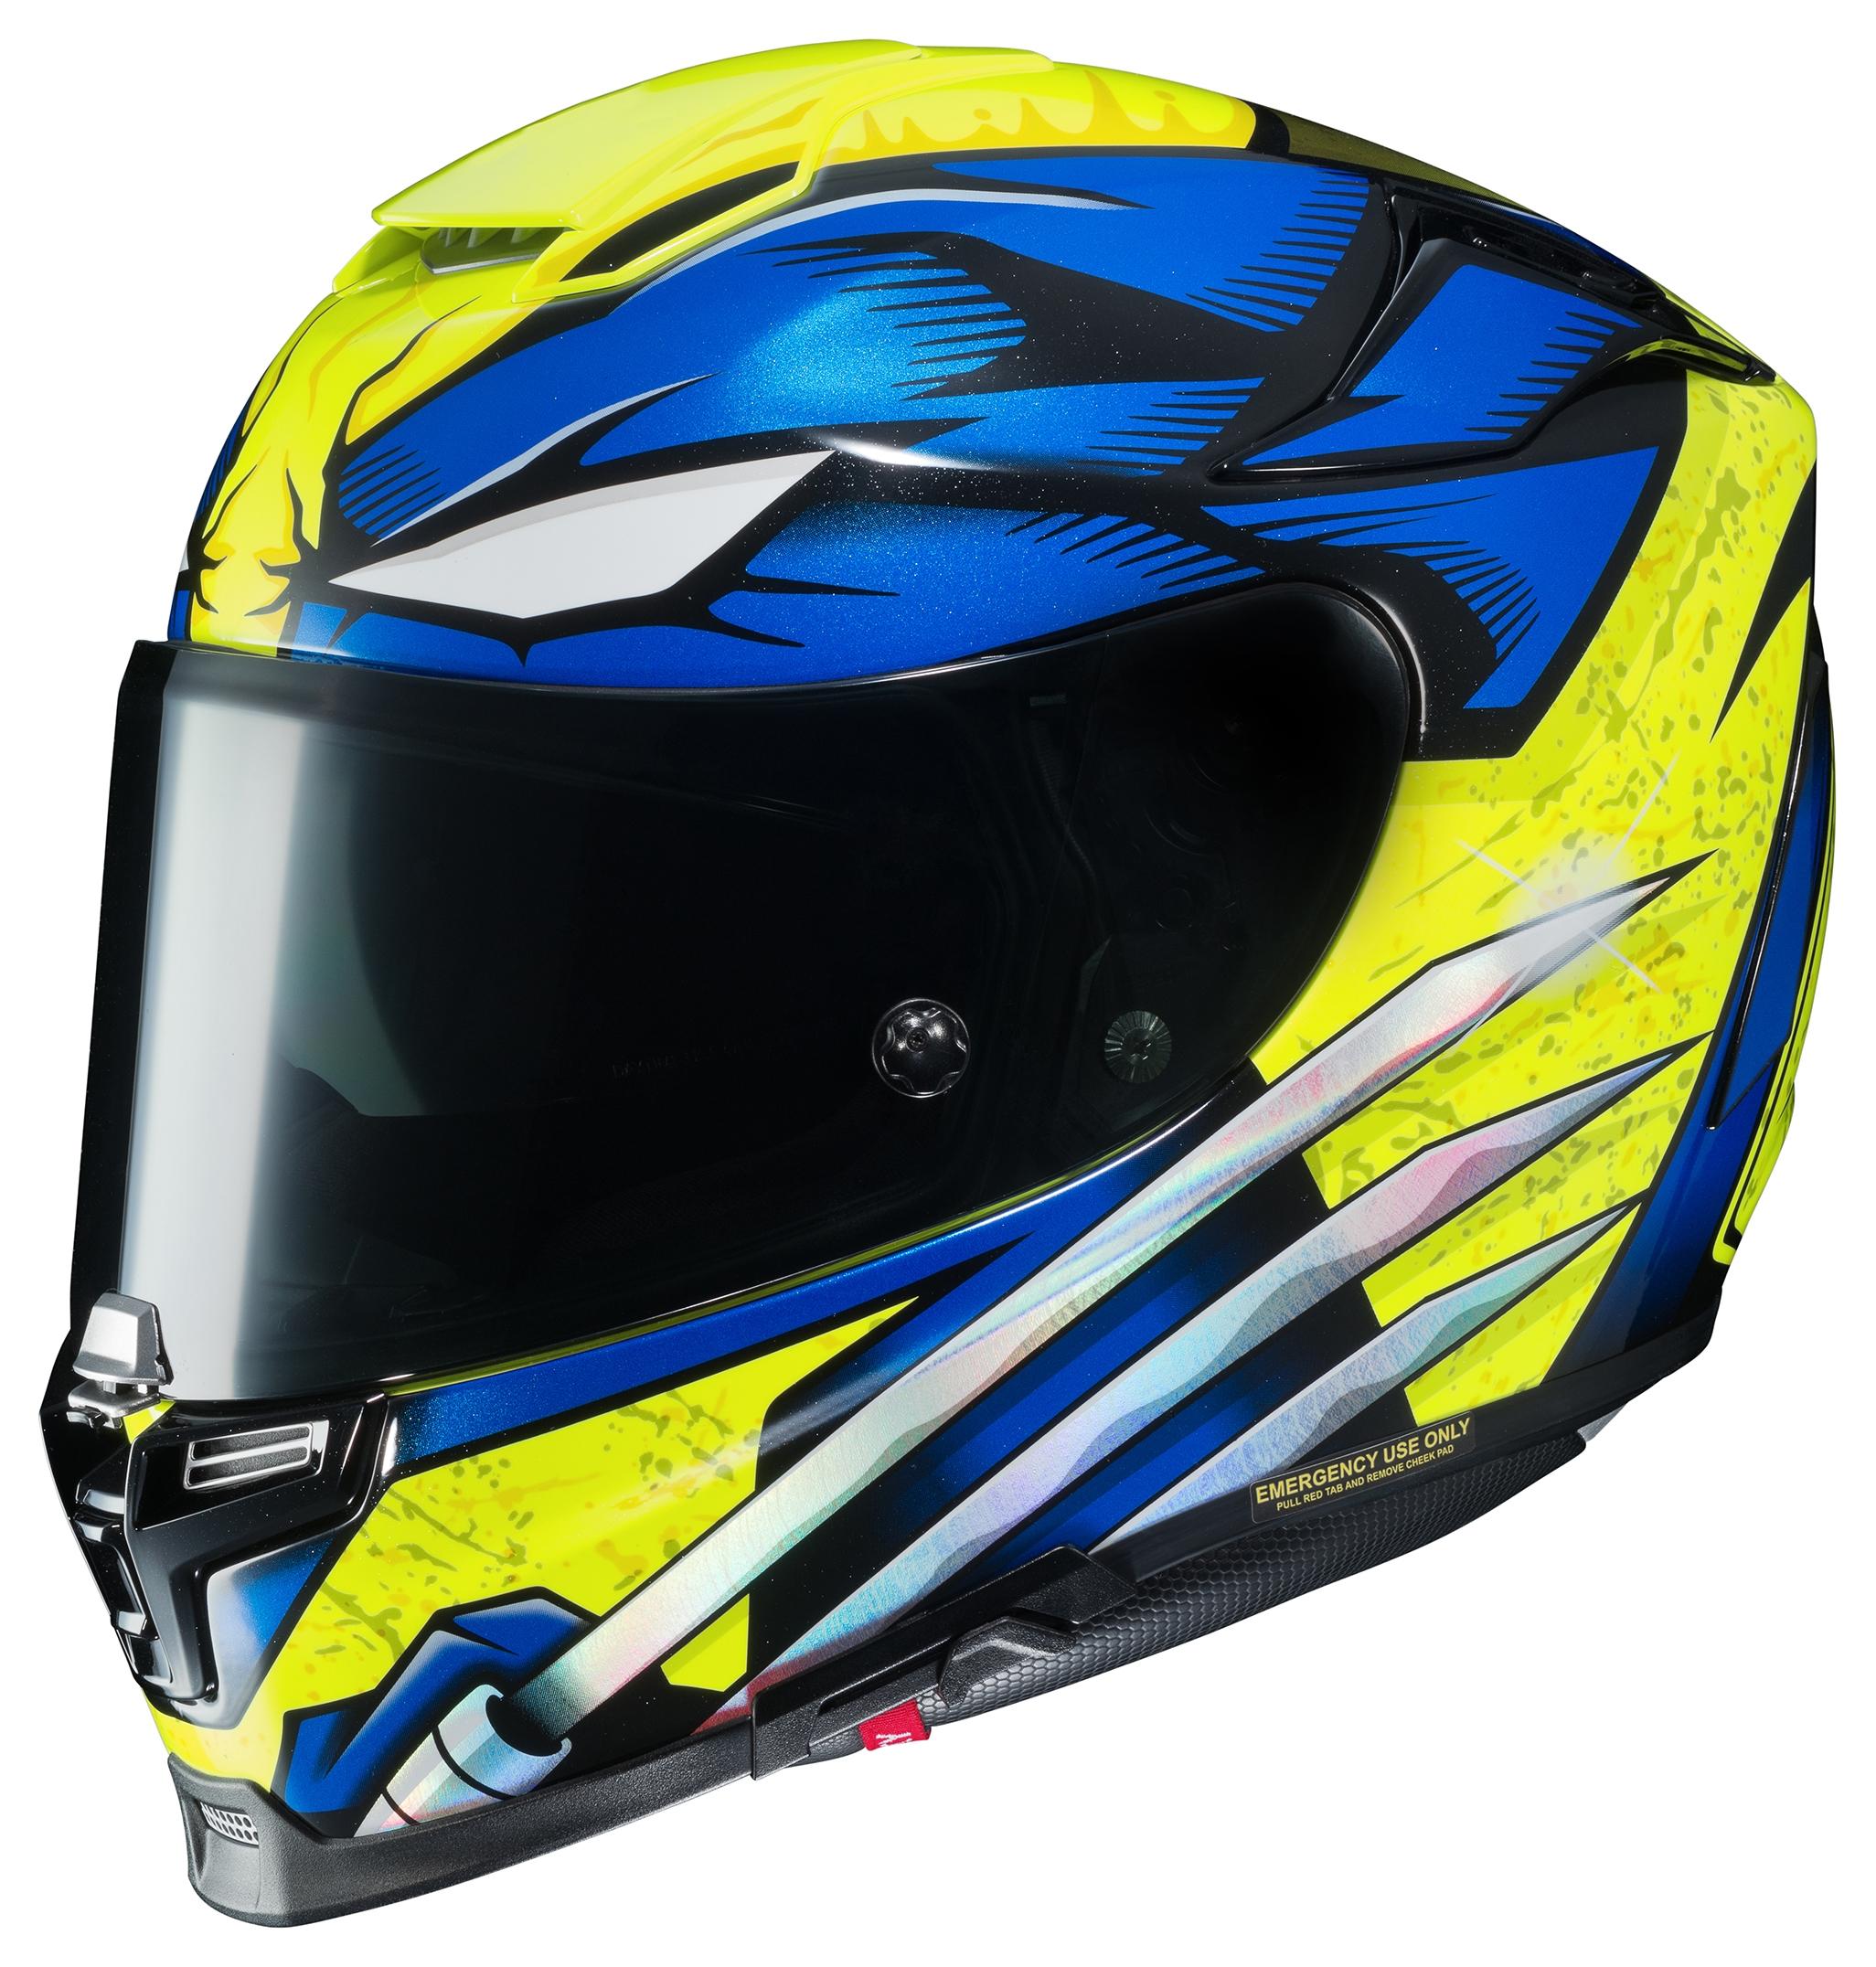 5accb7c5 HJC RPHA 70 ST Wolverine Helmet - Cycle Gear